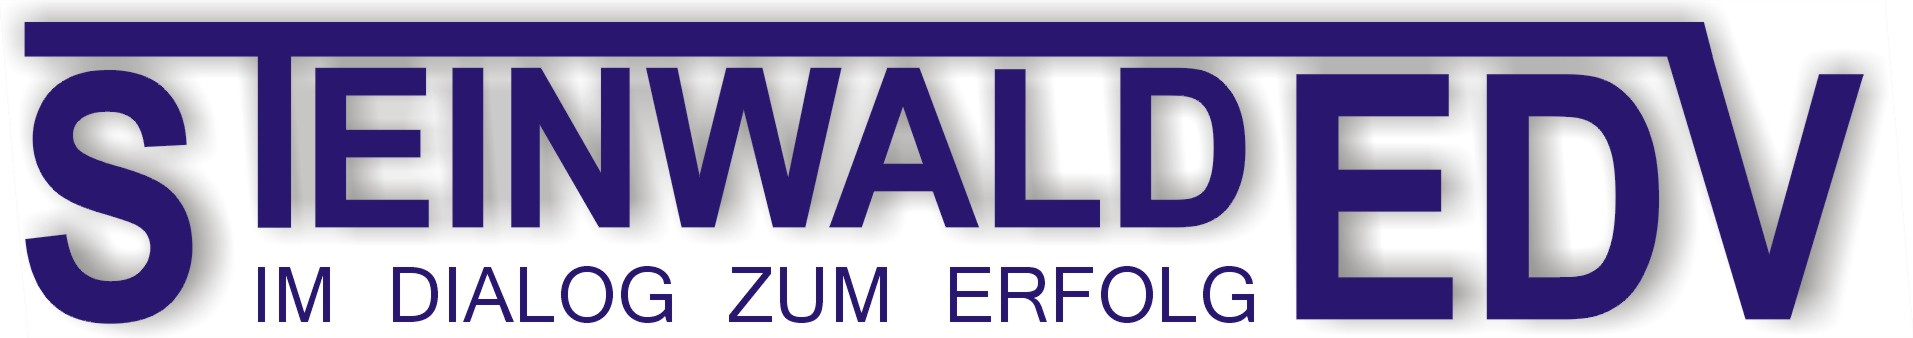 Steinwald Logo 01.07.08